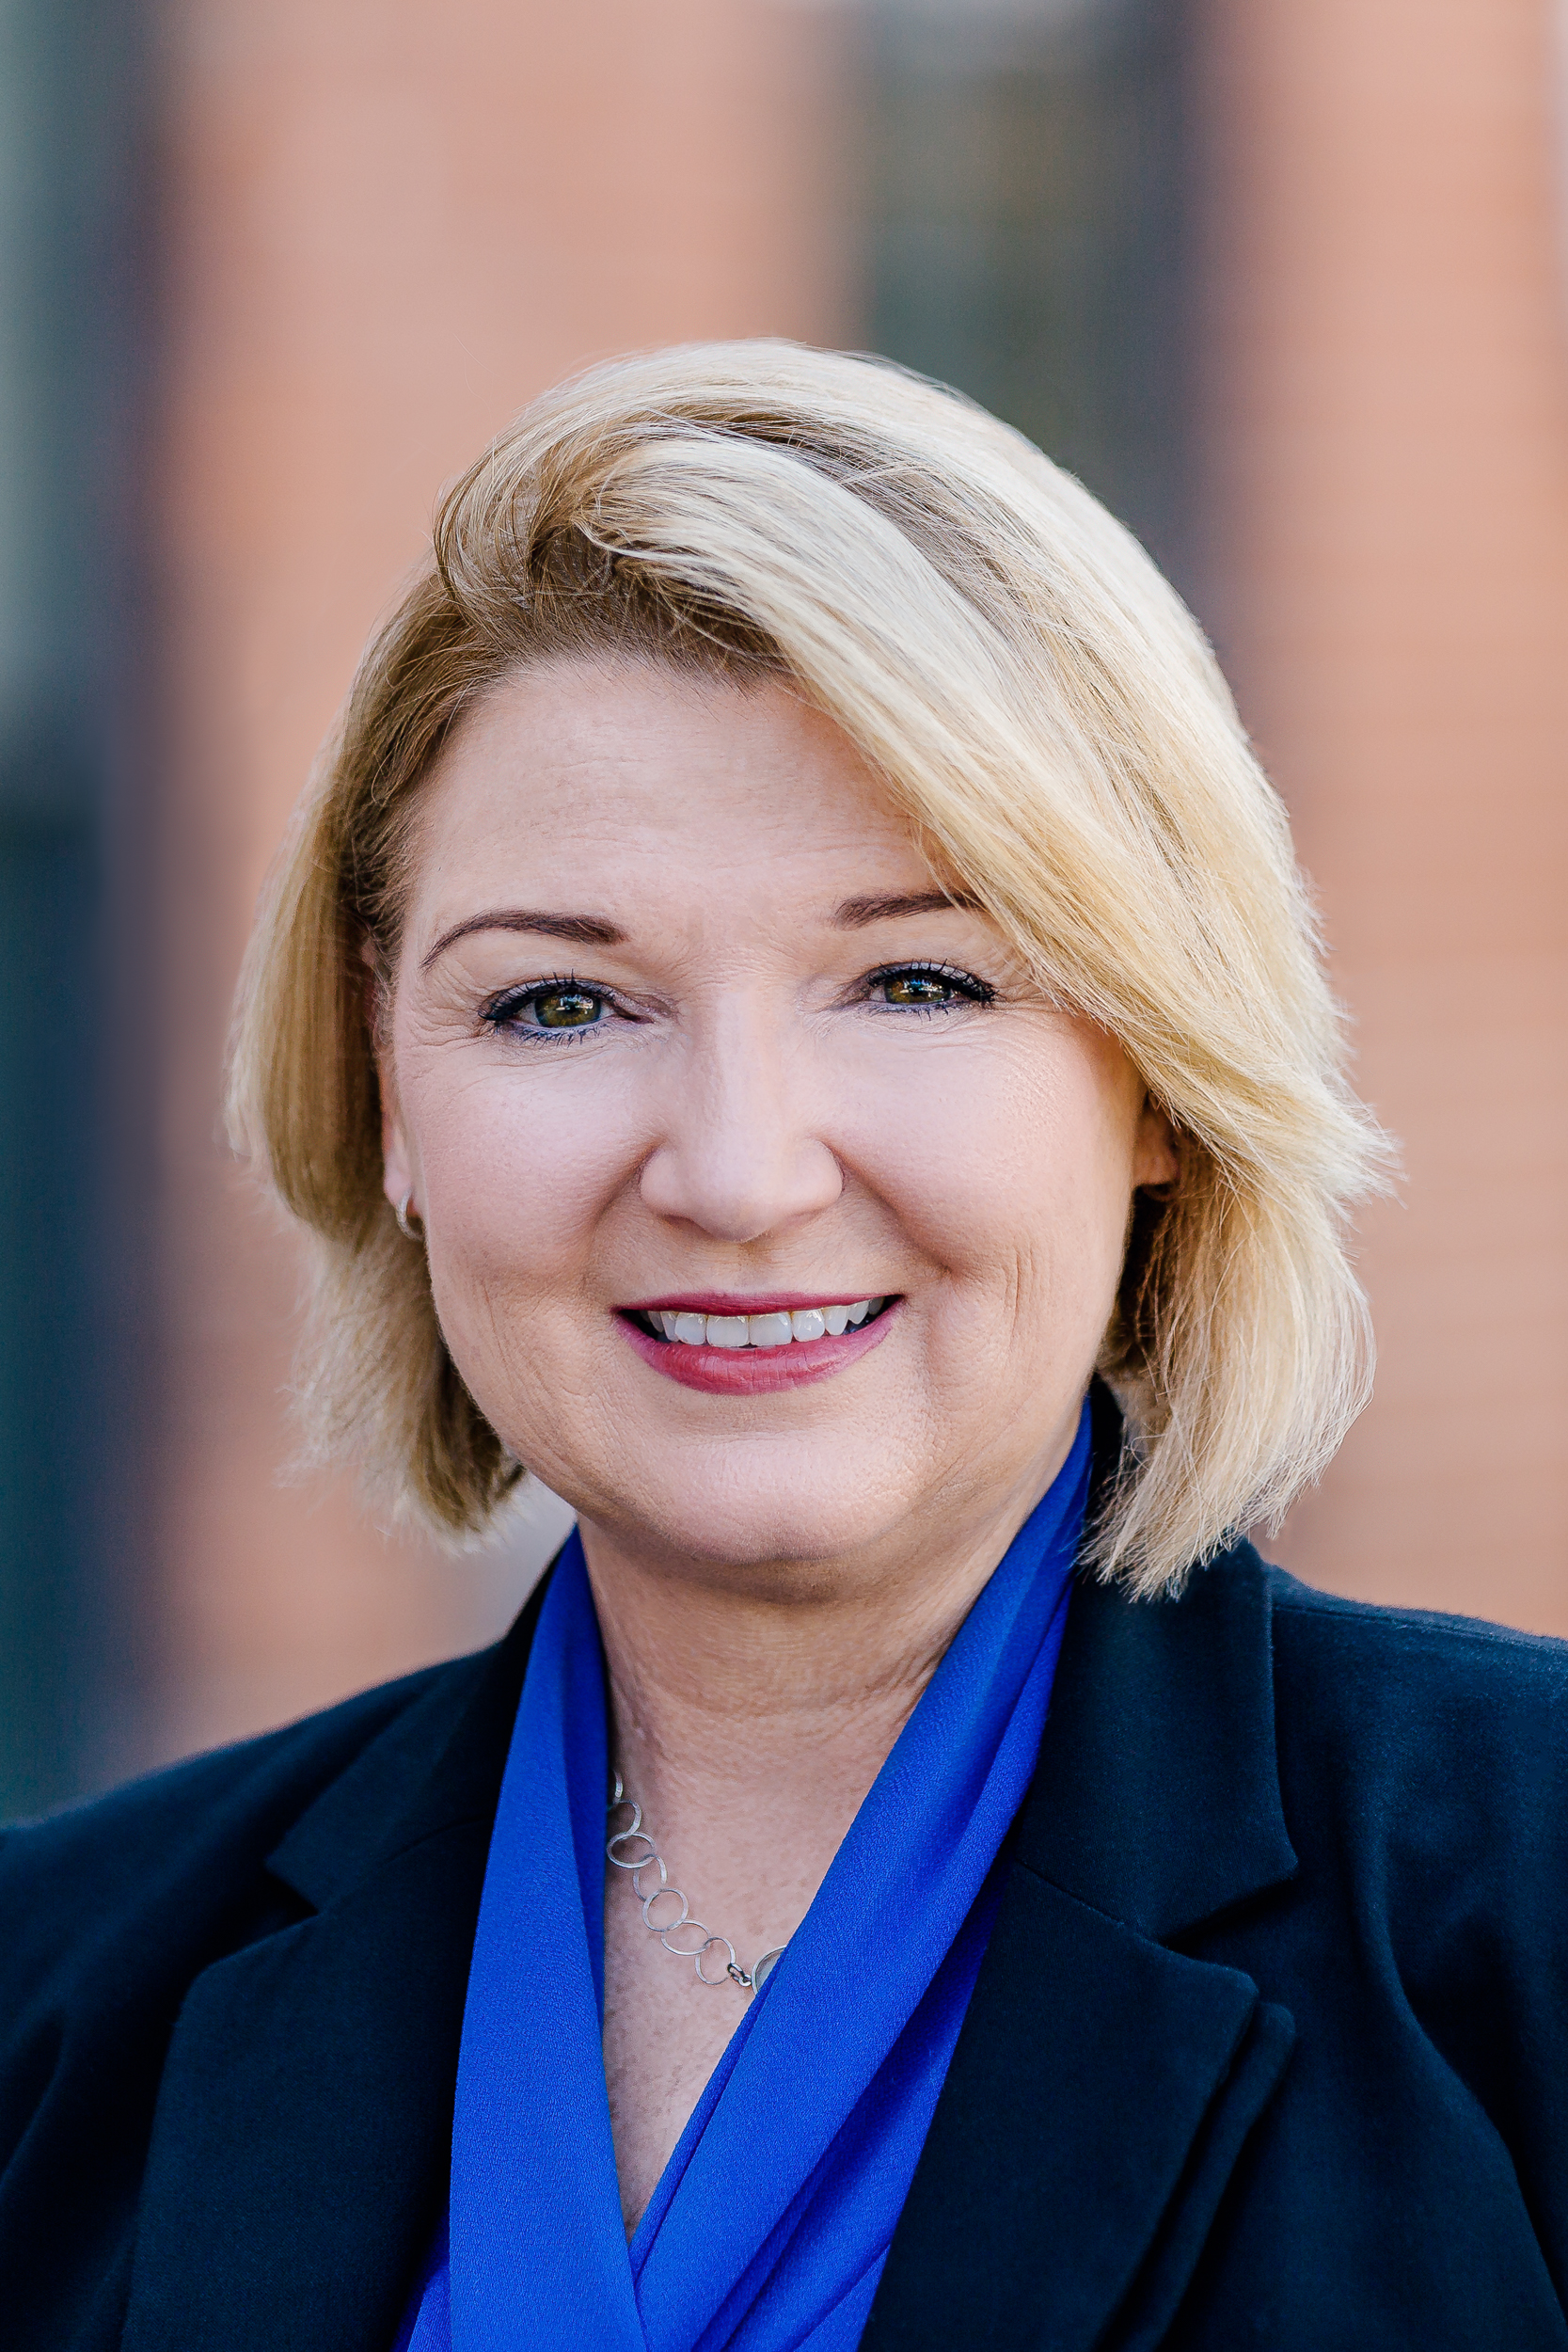 Tonnie Dosser, Executive Director